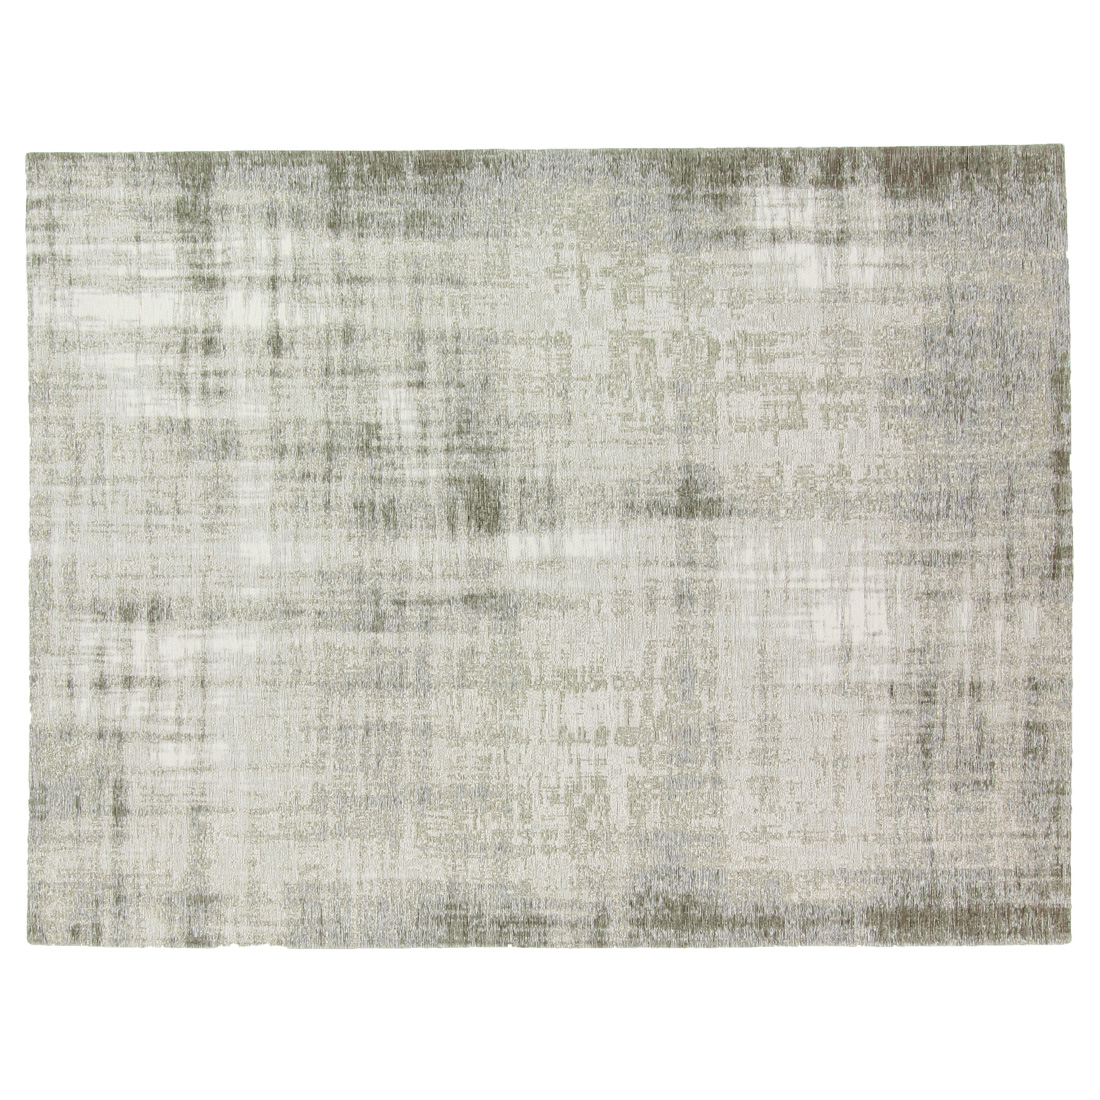 Vloerkleed Brinker Grunge Silver | 200 x 300 cm